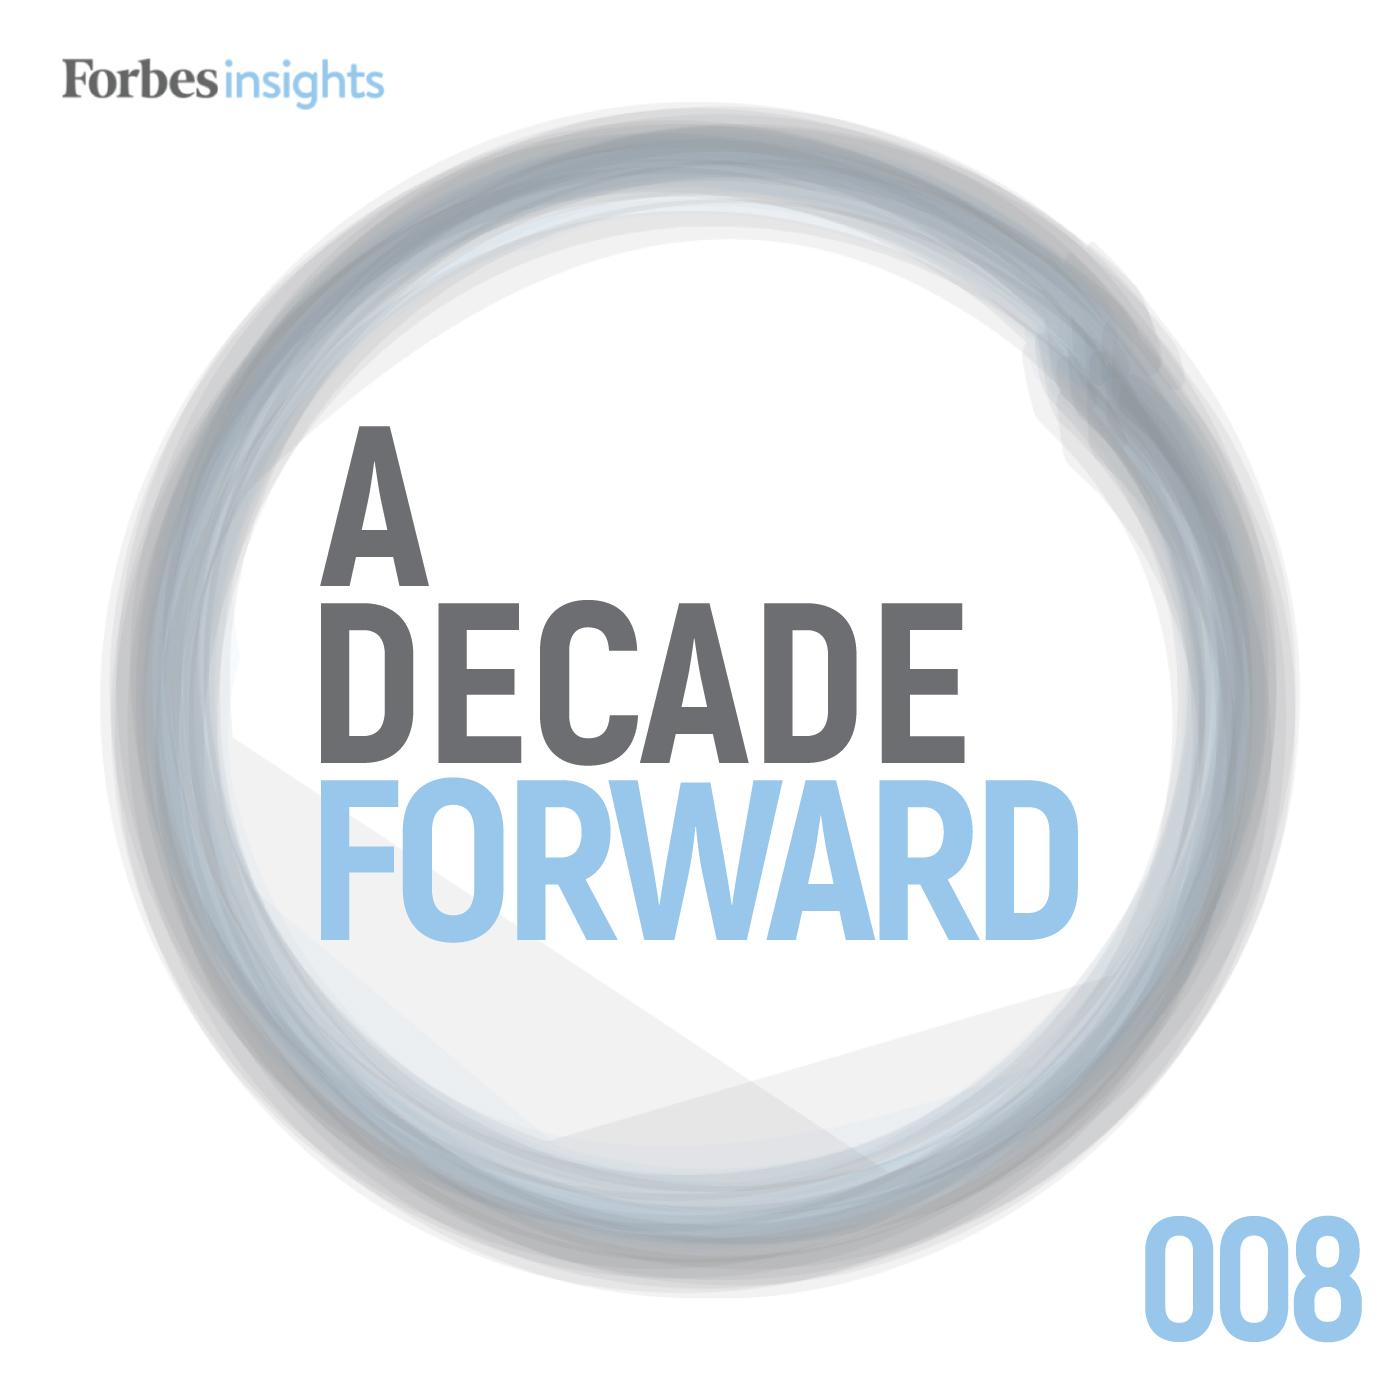 Frank Calderoni - Decade Forward